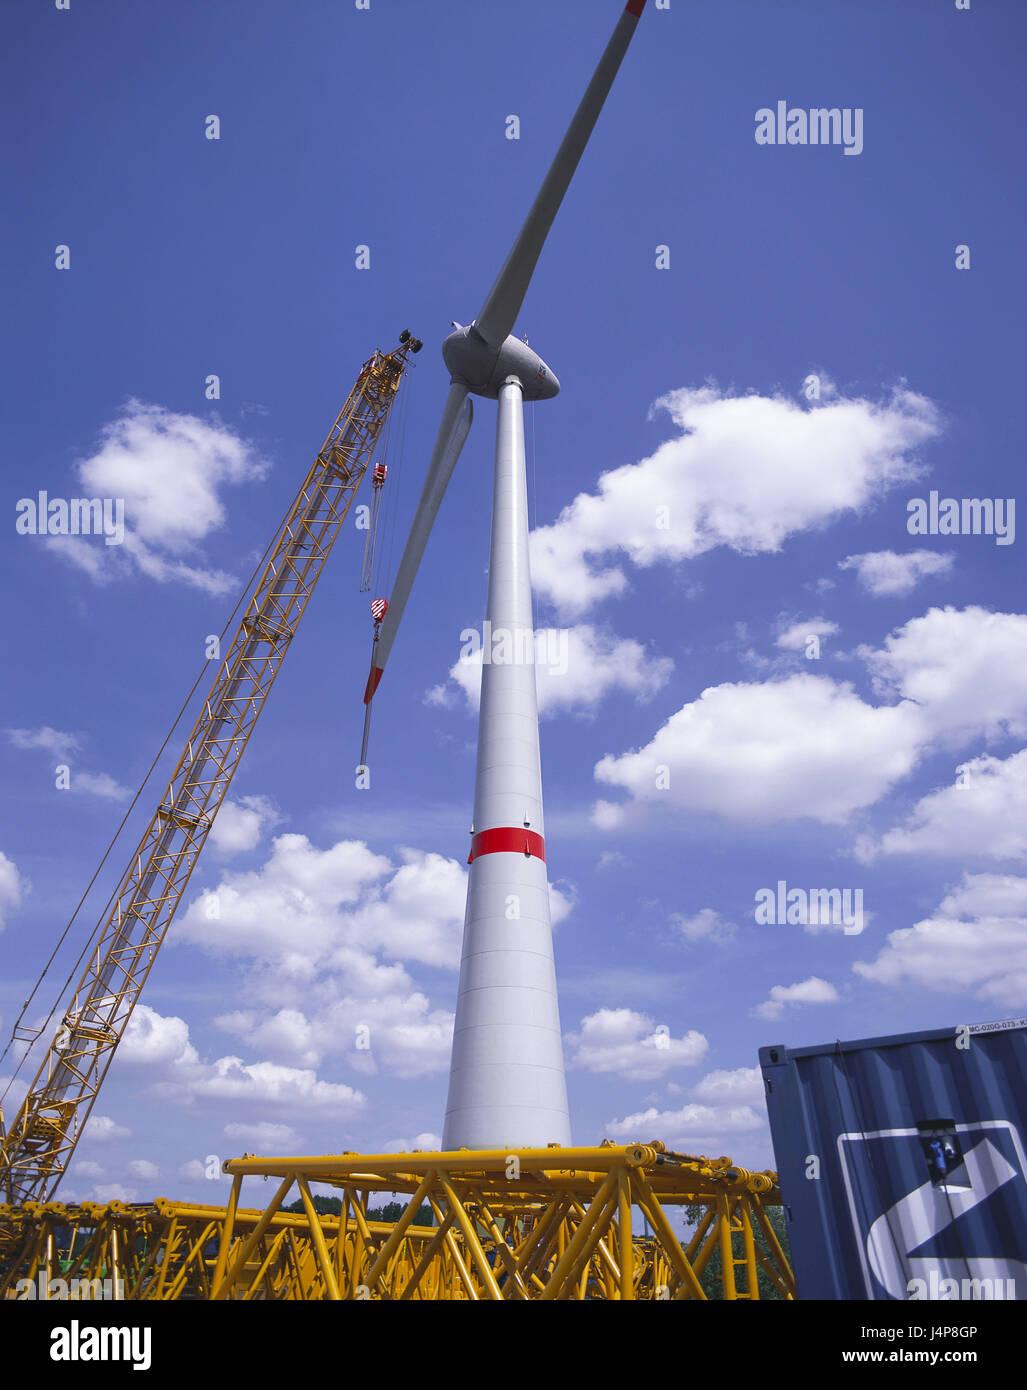 Germany, Hamburg-Altenwerder, wind turbine, crane, new building, North Germany, Hamburg, Altenwerder, electricity, Stock Photo